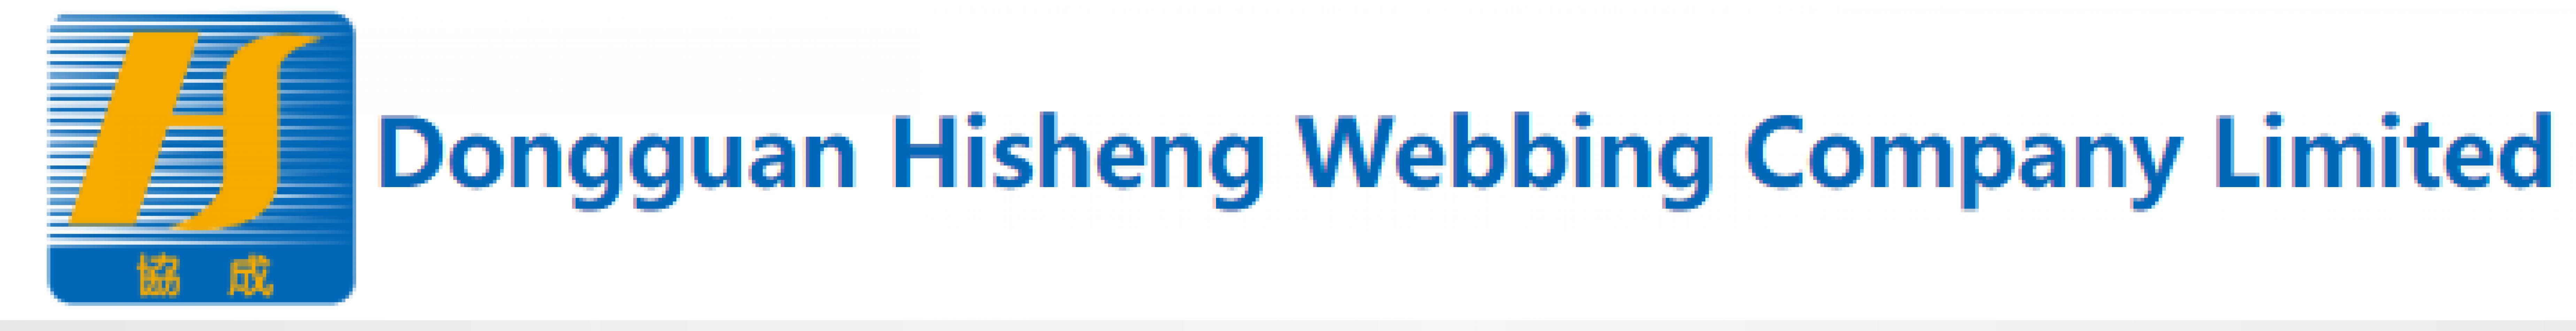 Dongguan Hisheng Webbing Company Limited